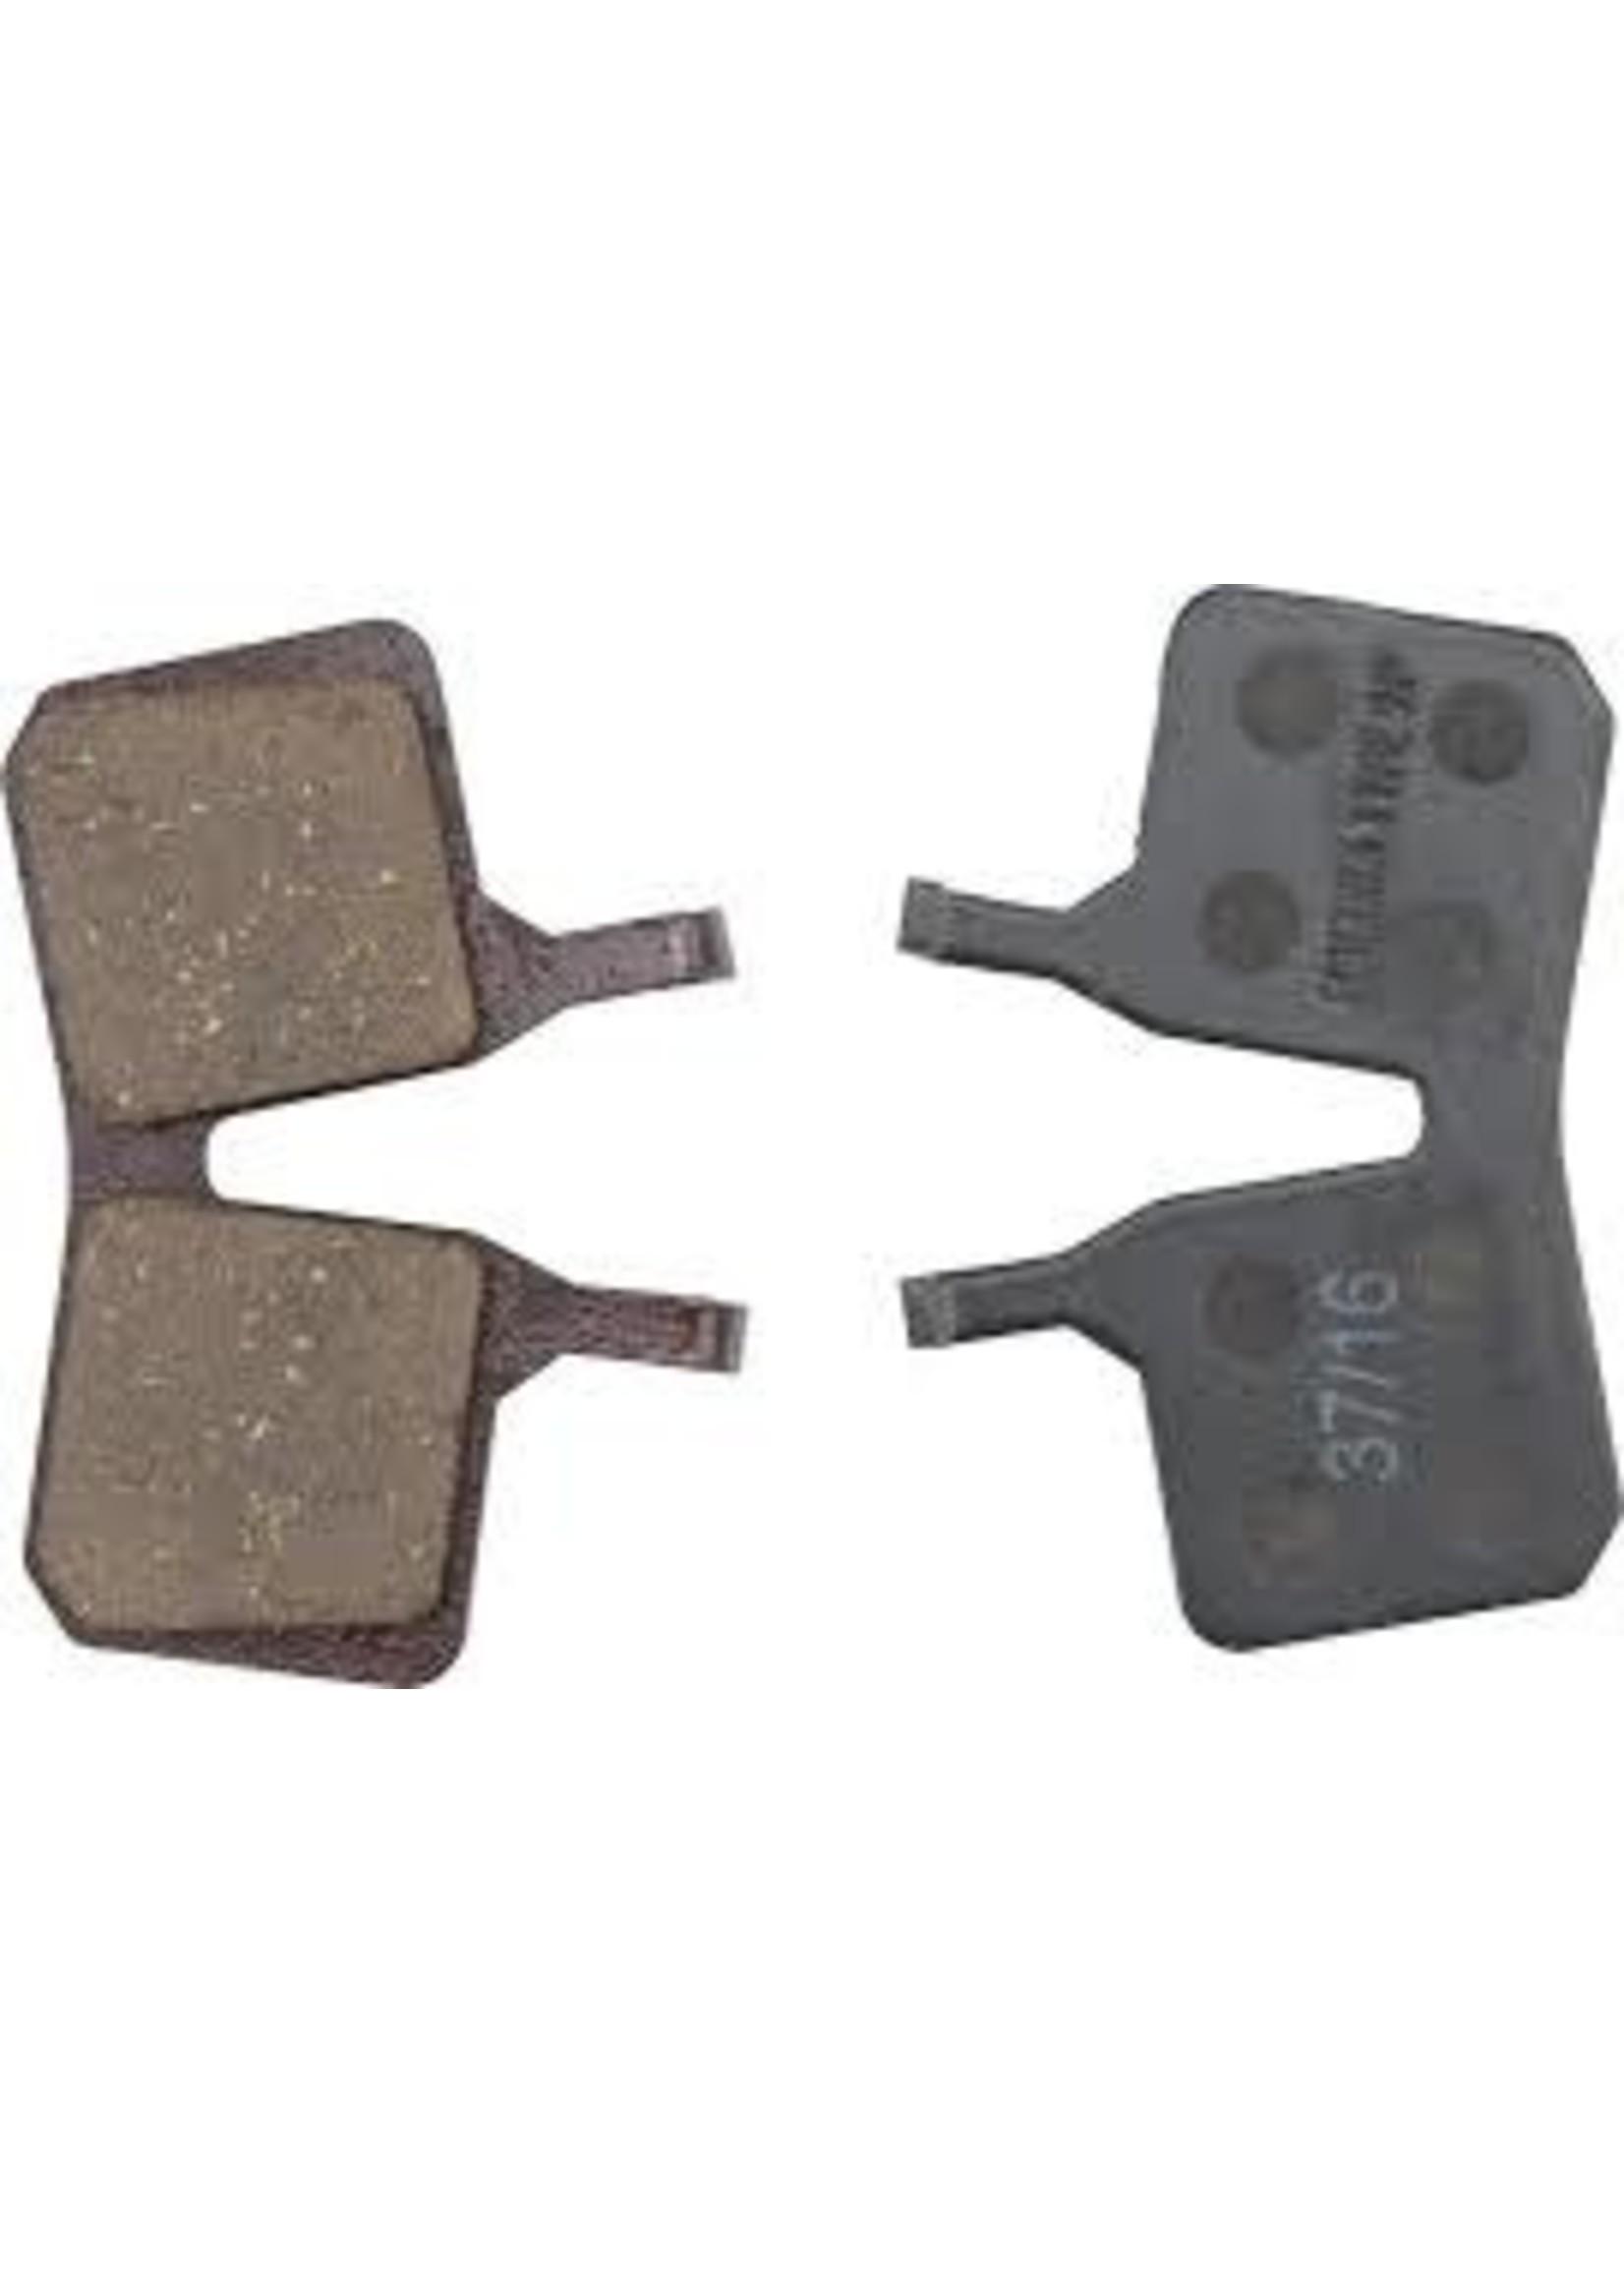 Magura Magura 9P performace pads one piece